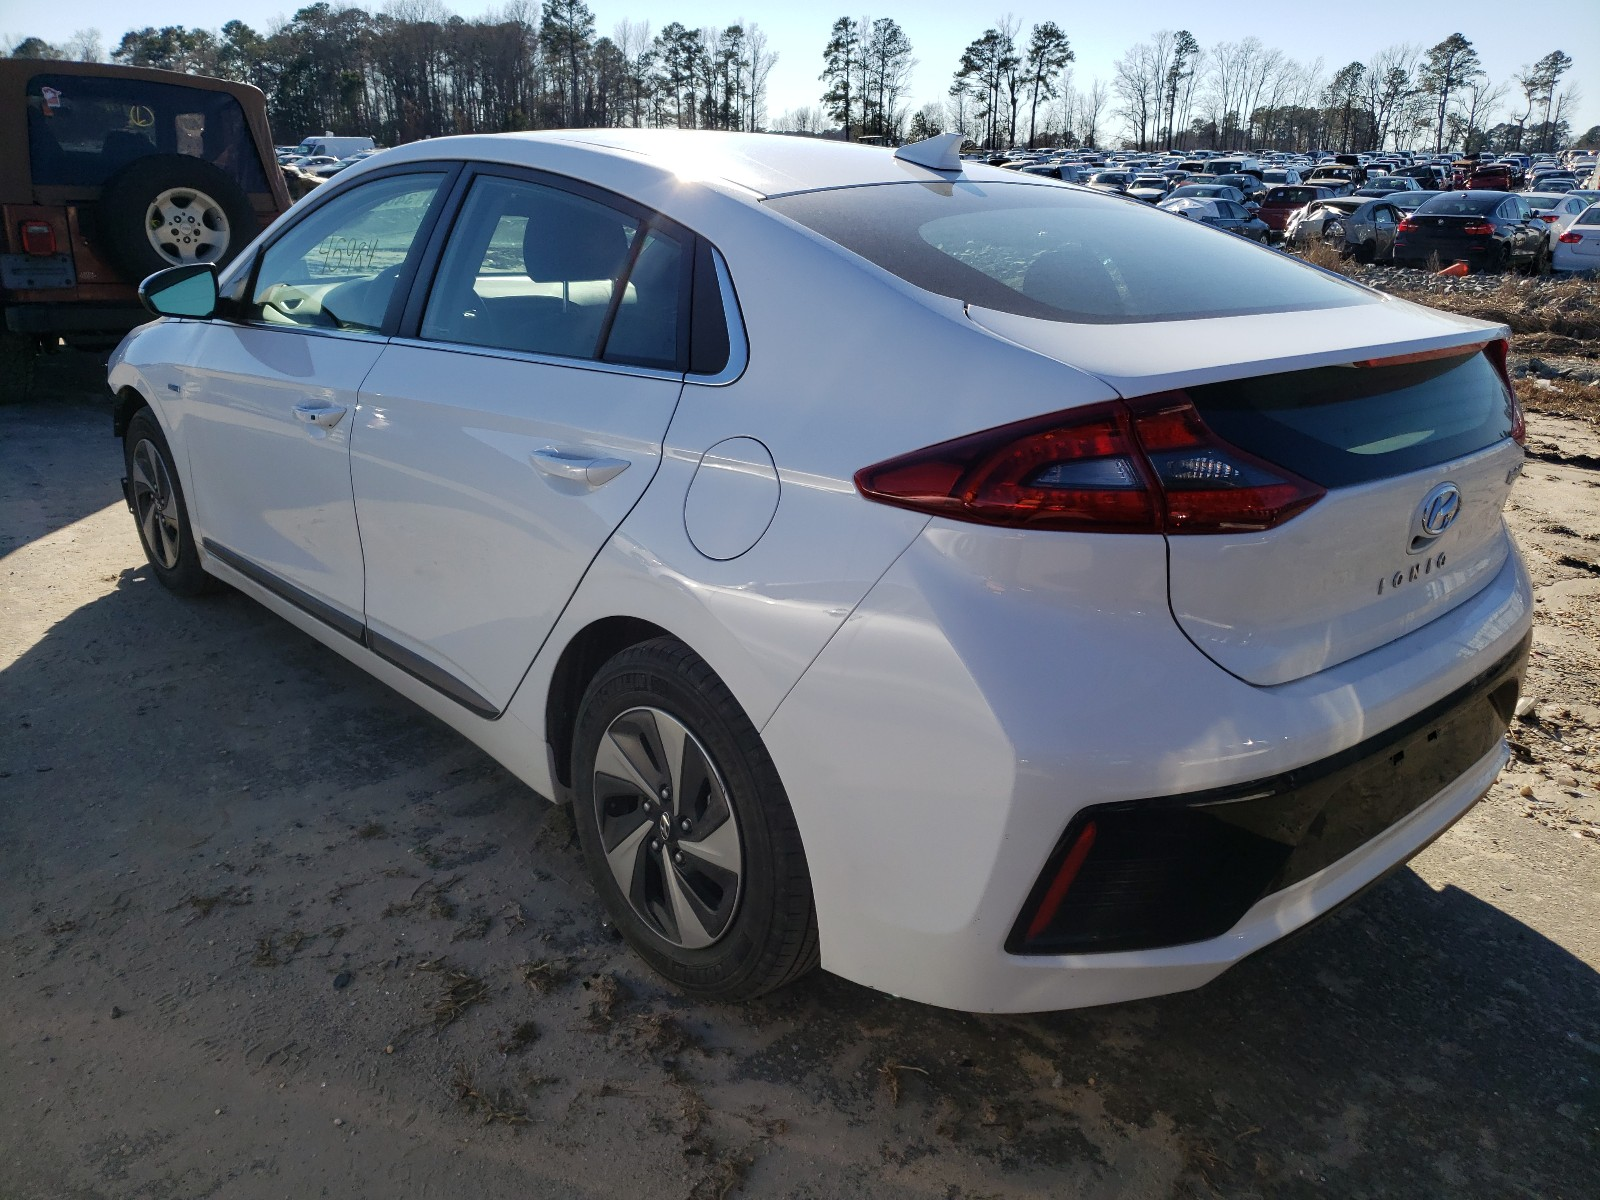 Hyundai Ioniq SEL 2019 VIN KMHC75LC1KU130811